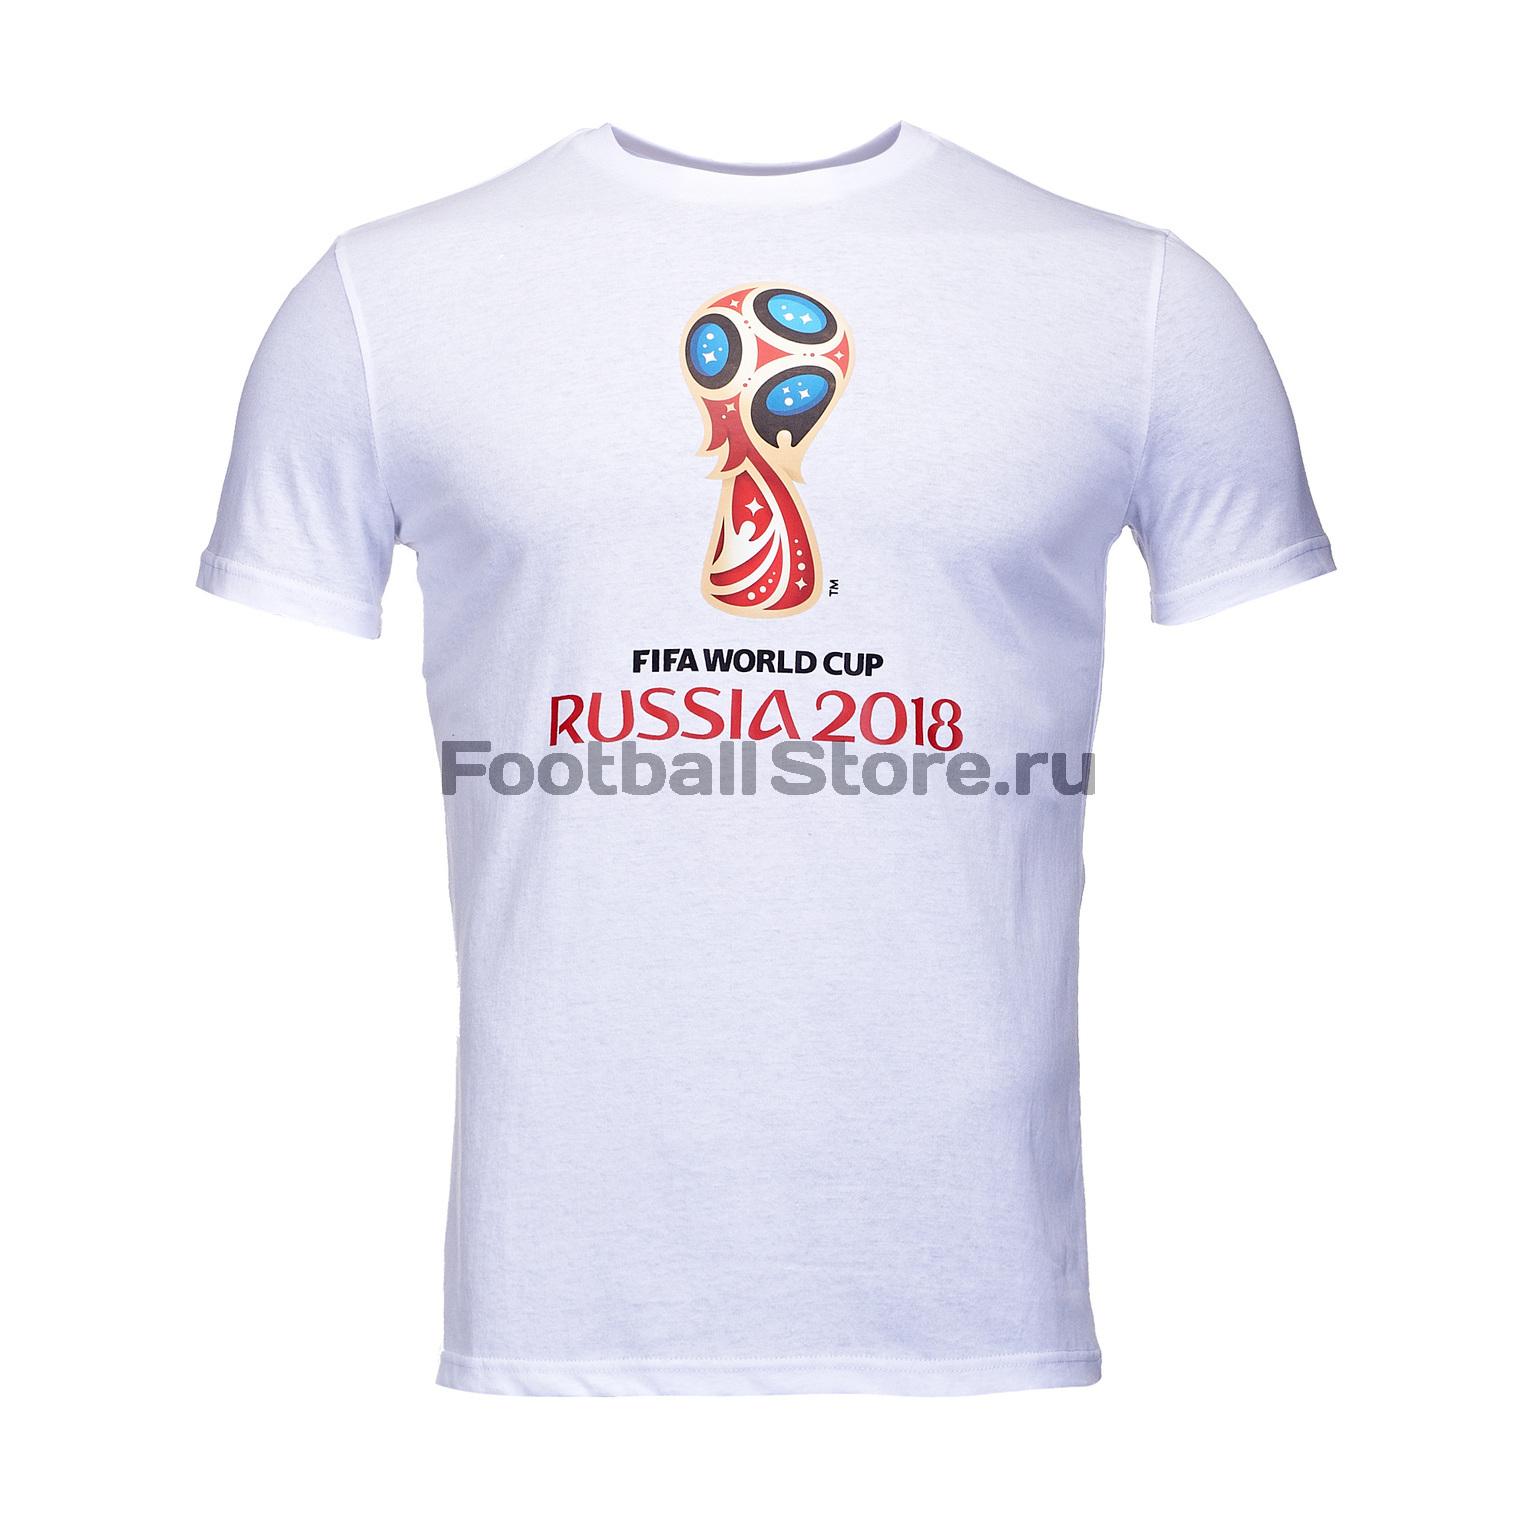 Футболка  Эмблема FIFA-2018 белый арт.F-17-1C-O-W фанатская атрибутика nike curry nba